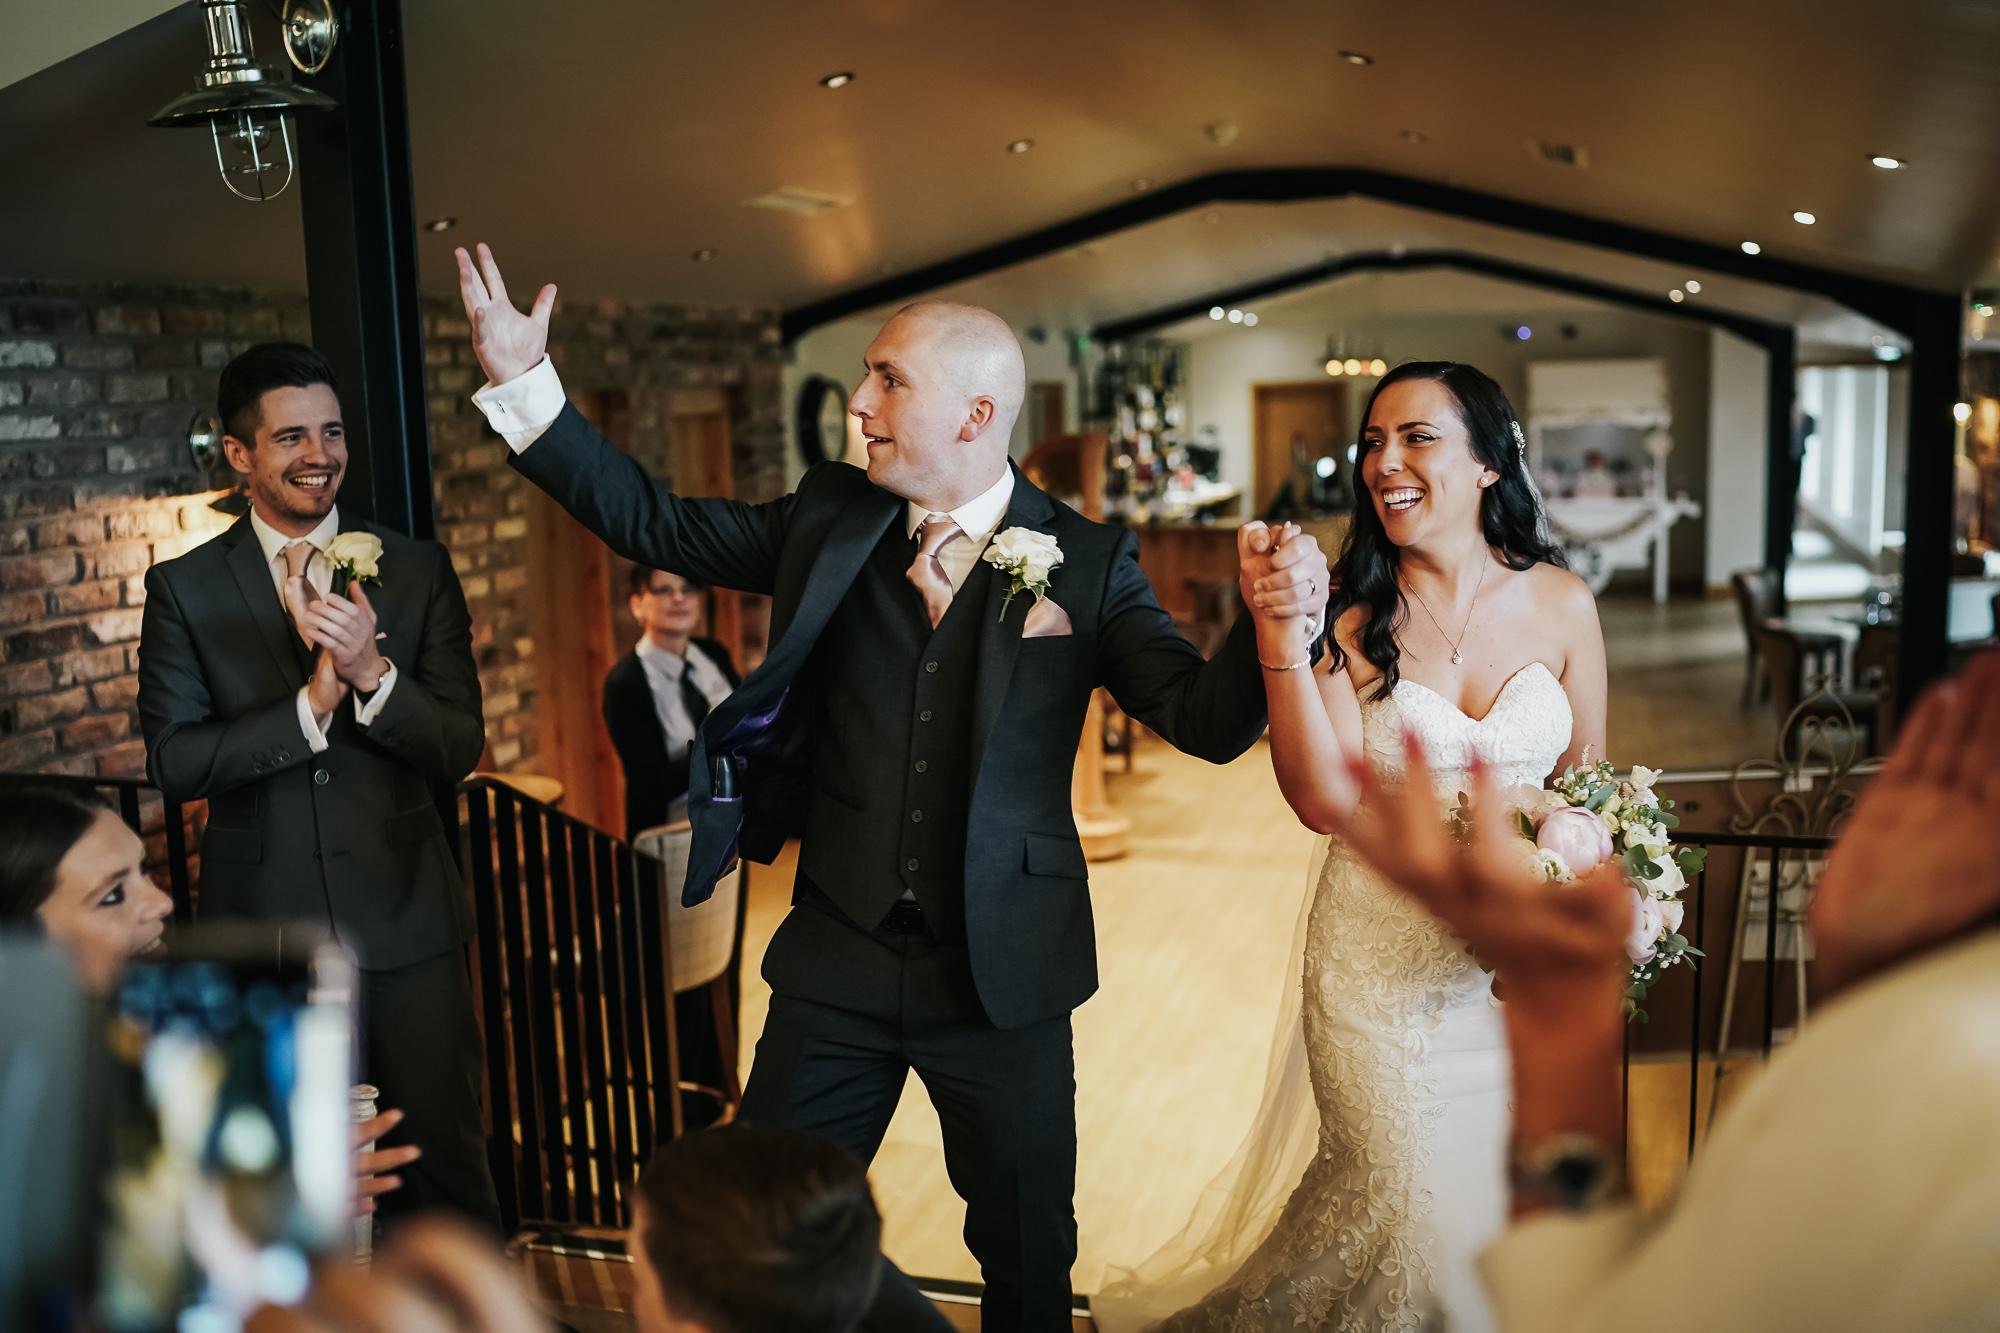 Hyde Bank Farm Wedding Photography Manchester wedding photographer (37 of 49).jpg